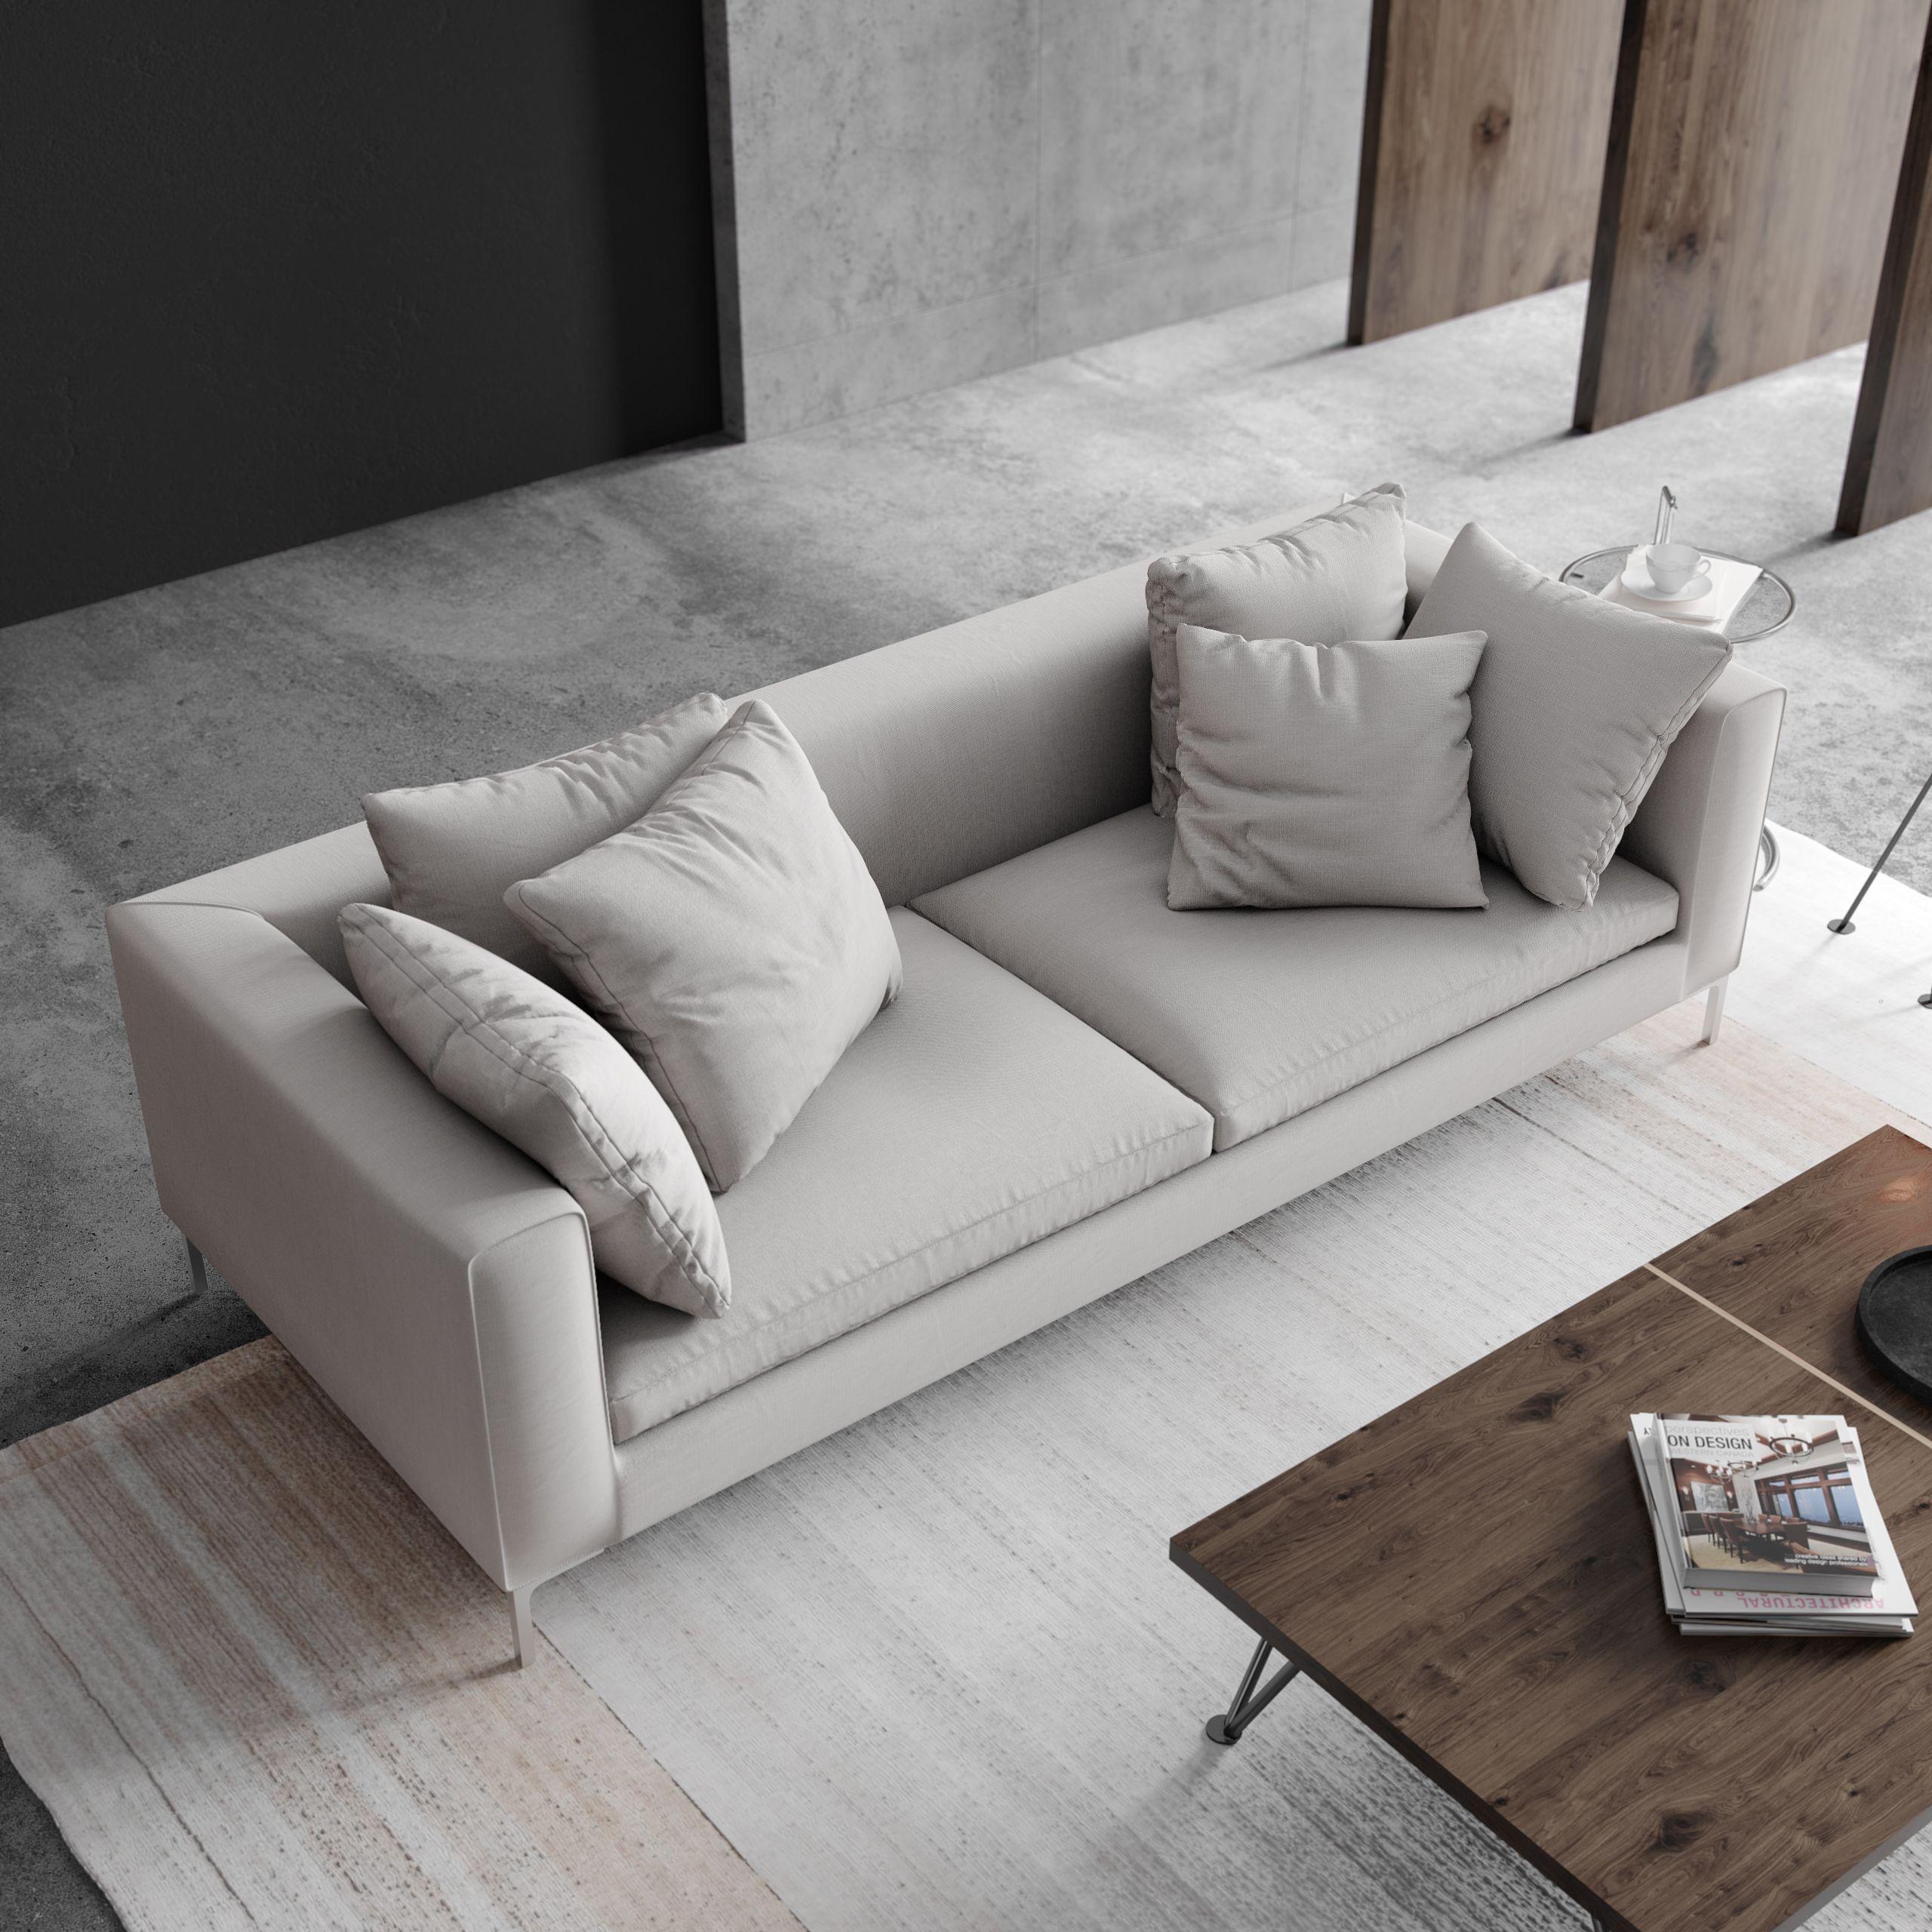 Hugo Sofa Rove Concepts Rove Concepts Mid Century Furniture In